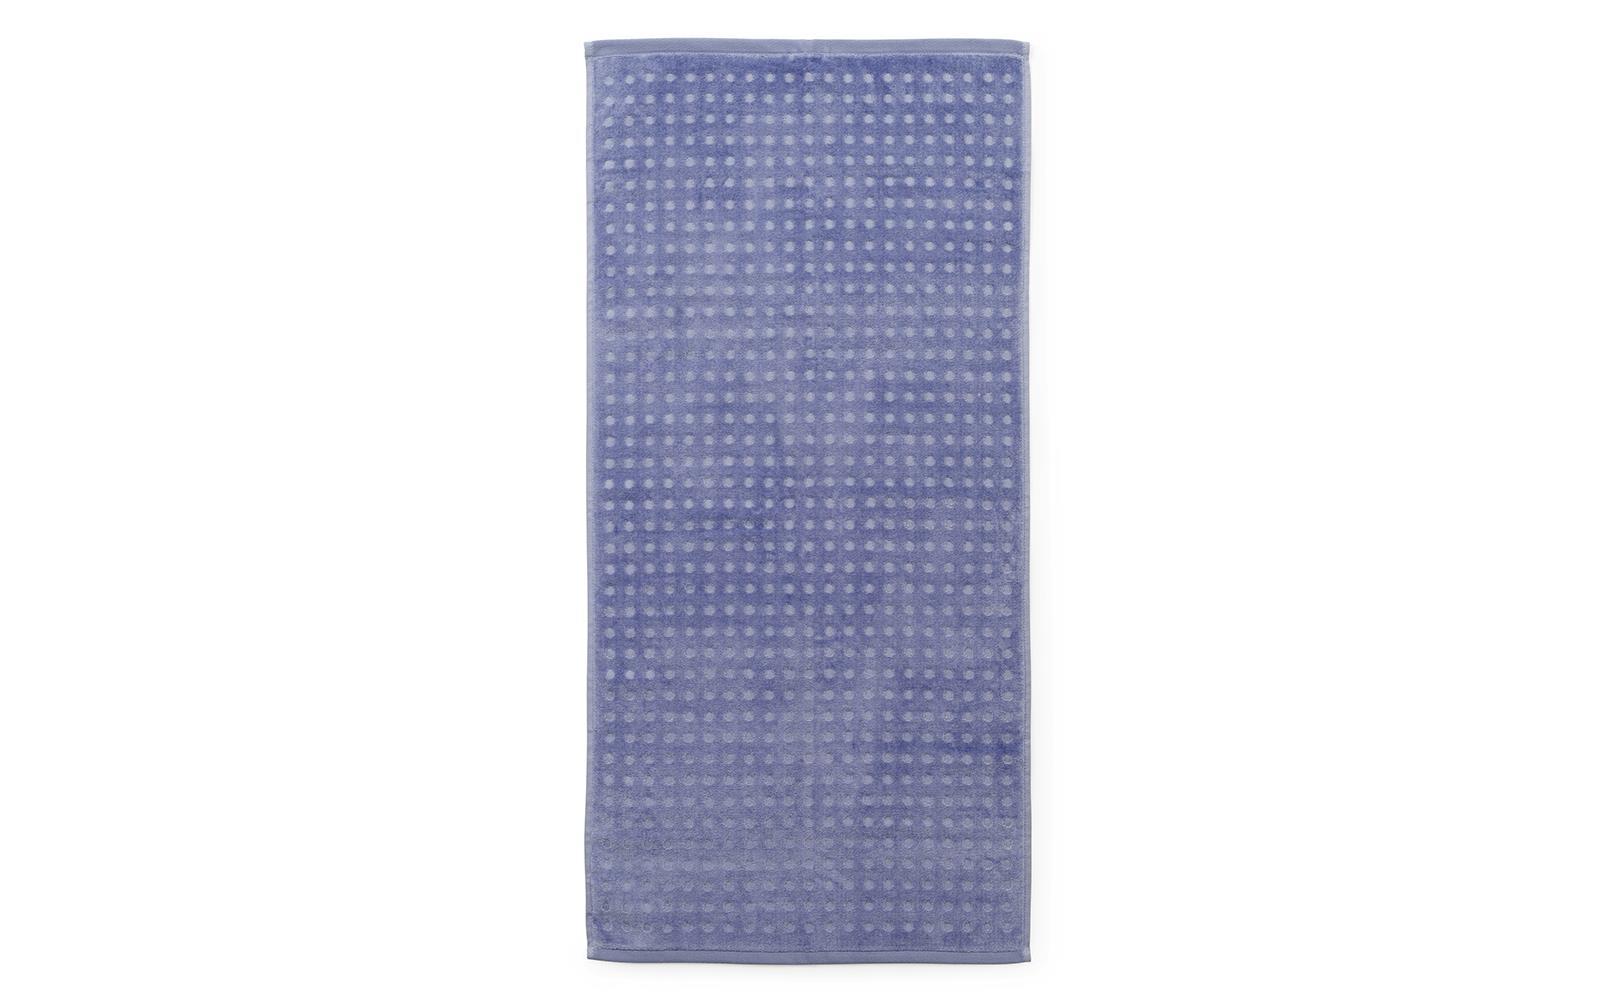 â??Normann Copenhagen - Imprint Håndklæde 140 x 70 cm - Dot Kornblomst